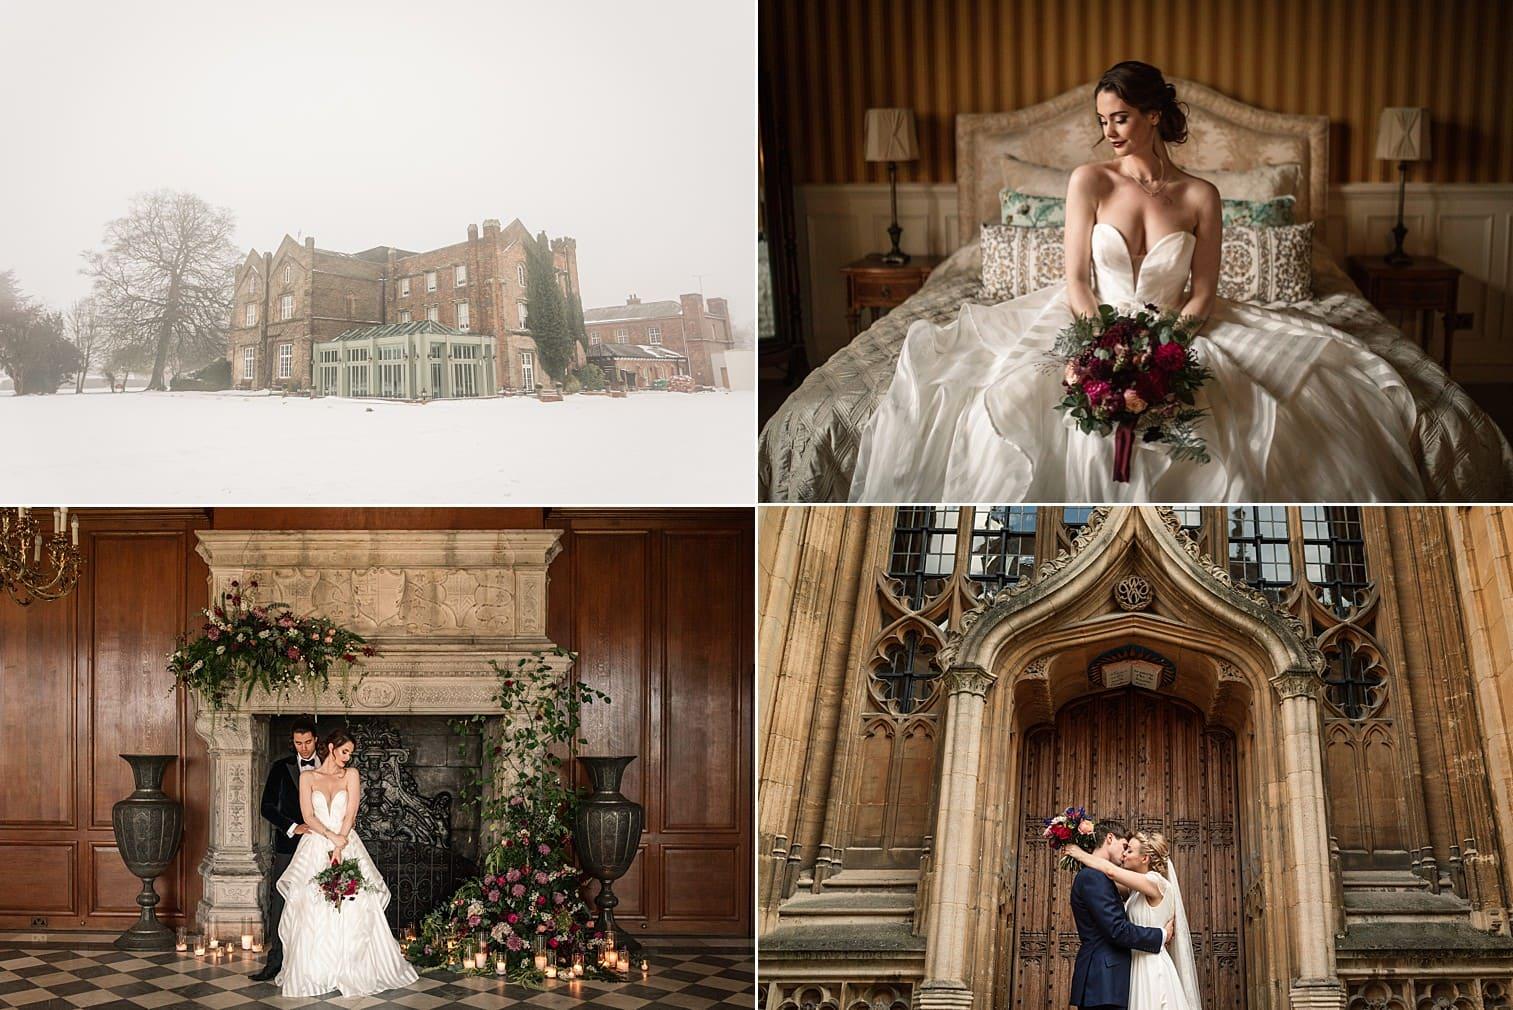 My Top Five Instagram Posts This Month | Best Wedding Photos in December 2018